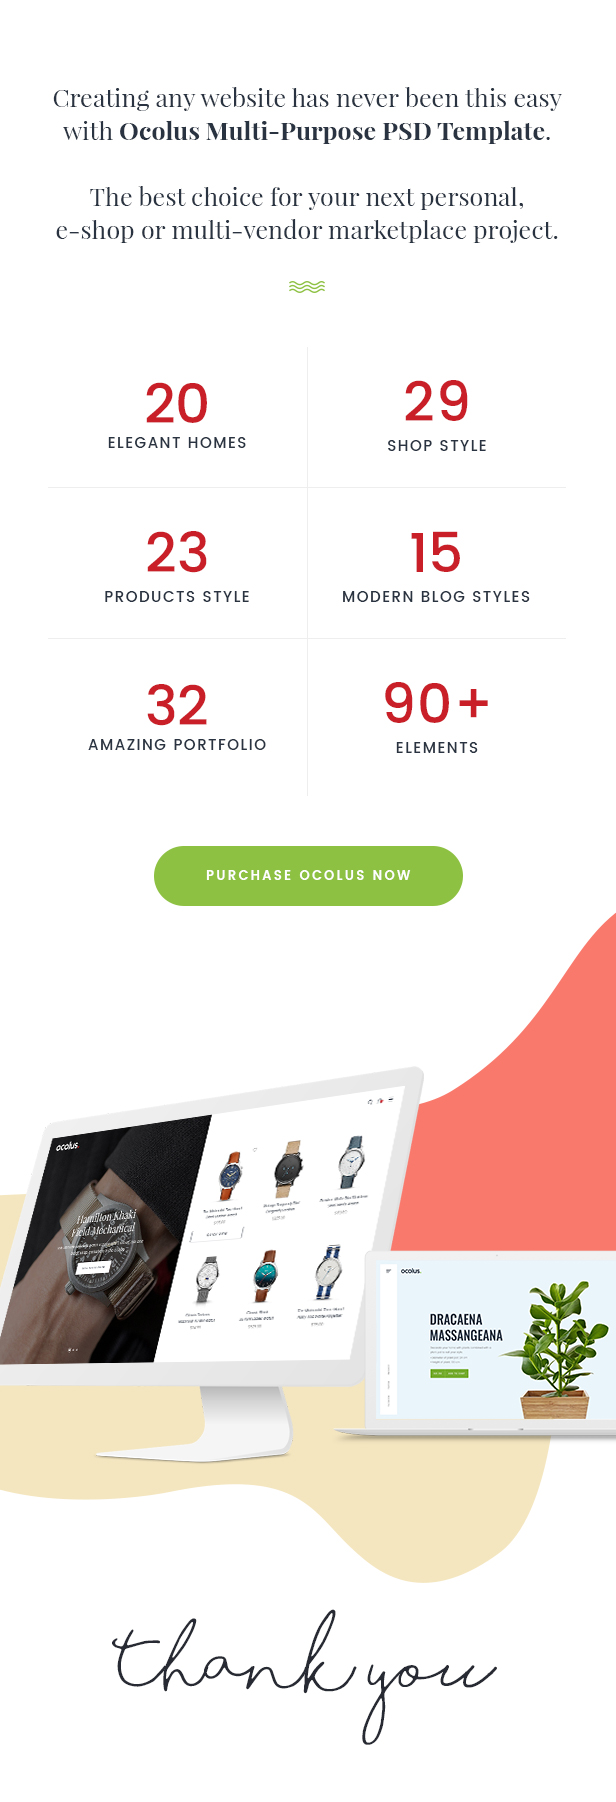 Ocolus - Creative & Modern Multi-Purpose eCommerce PSD Template - 7